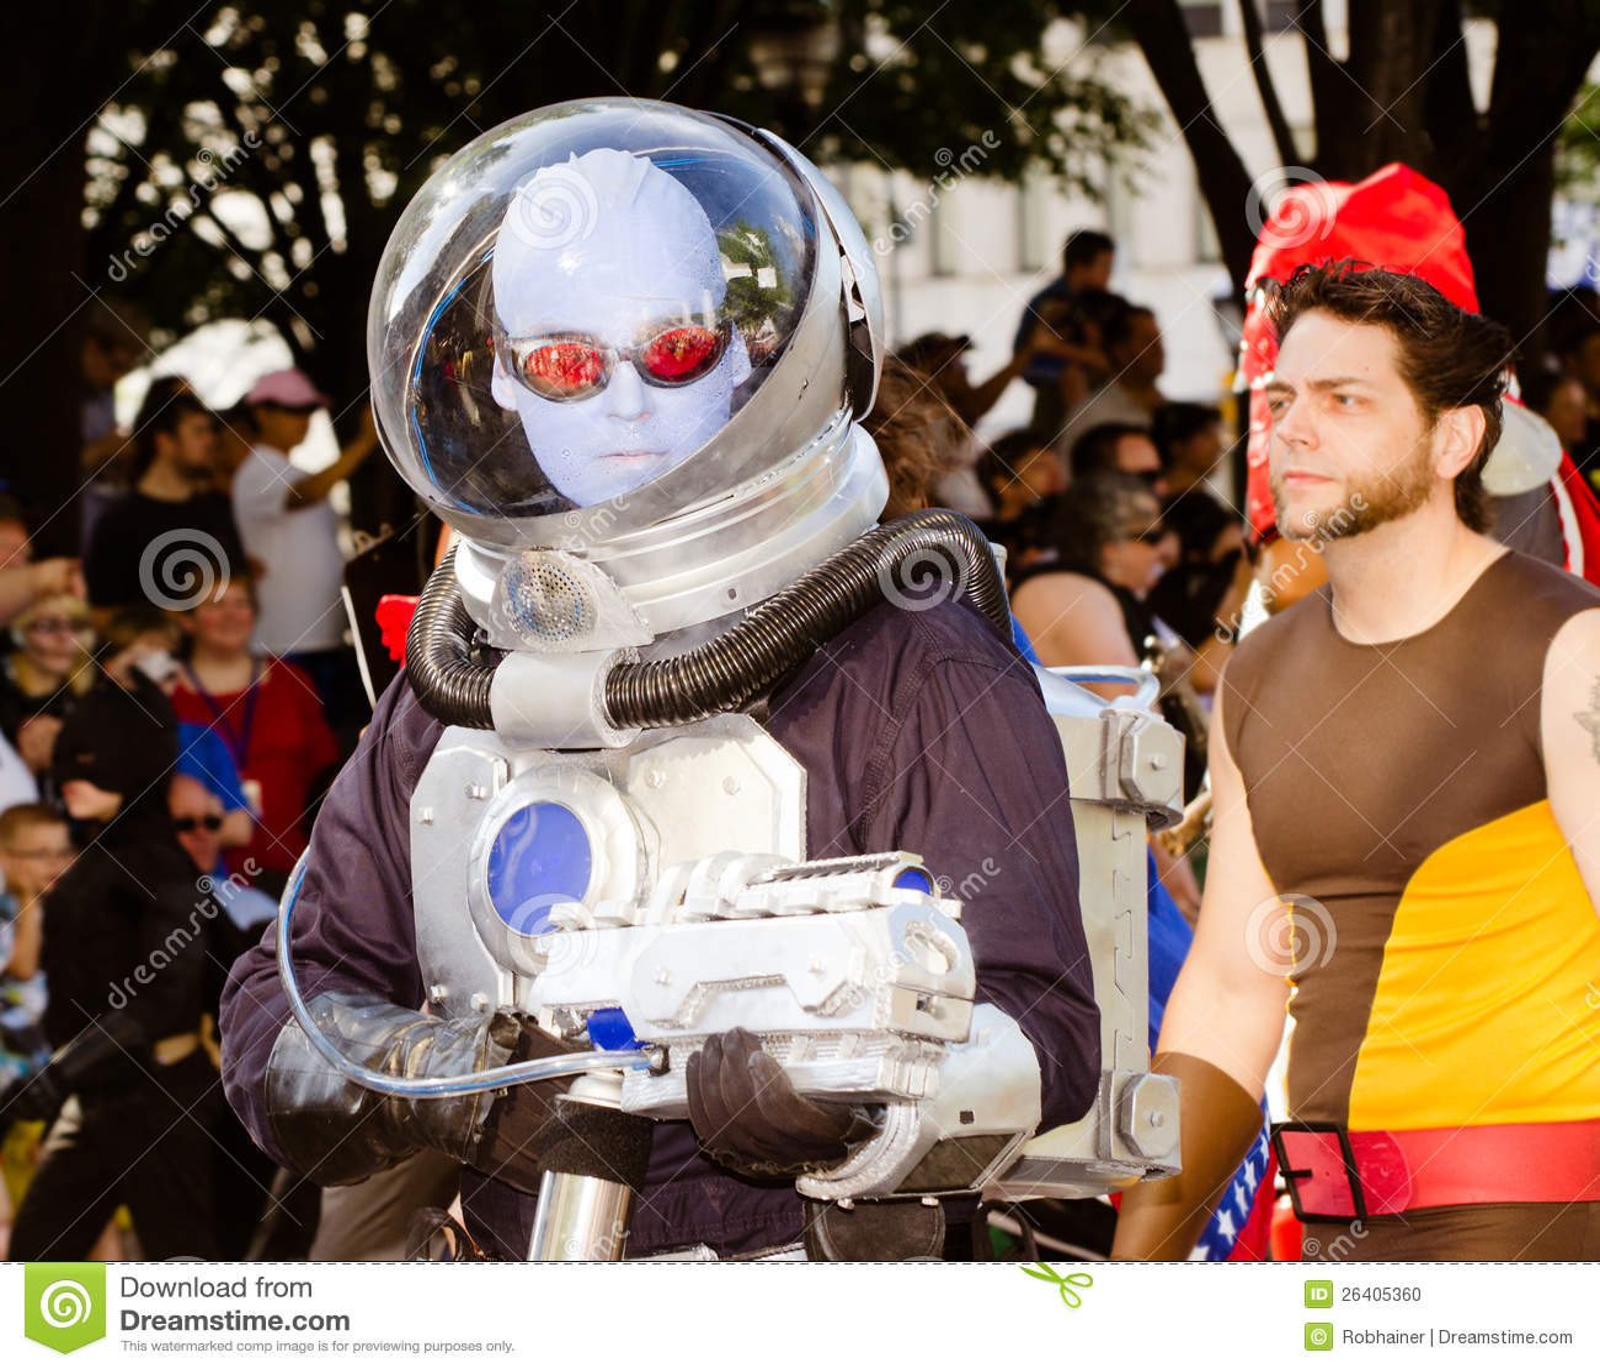 A comic book fan dressed as Mr. Freeze